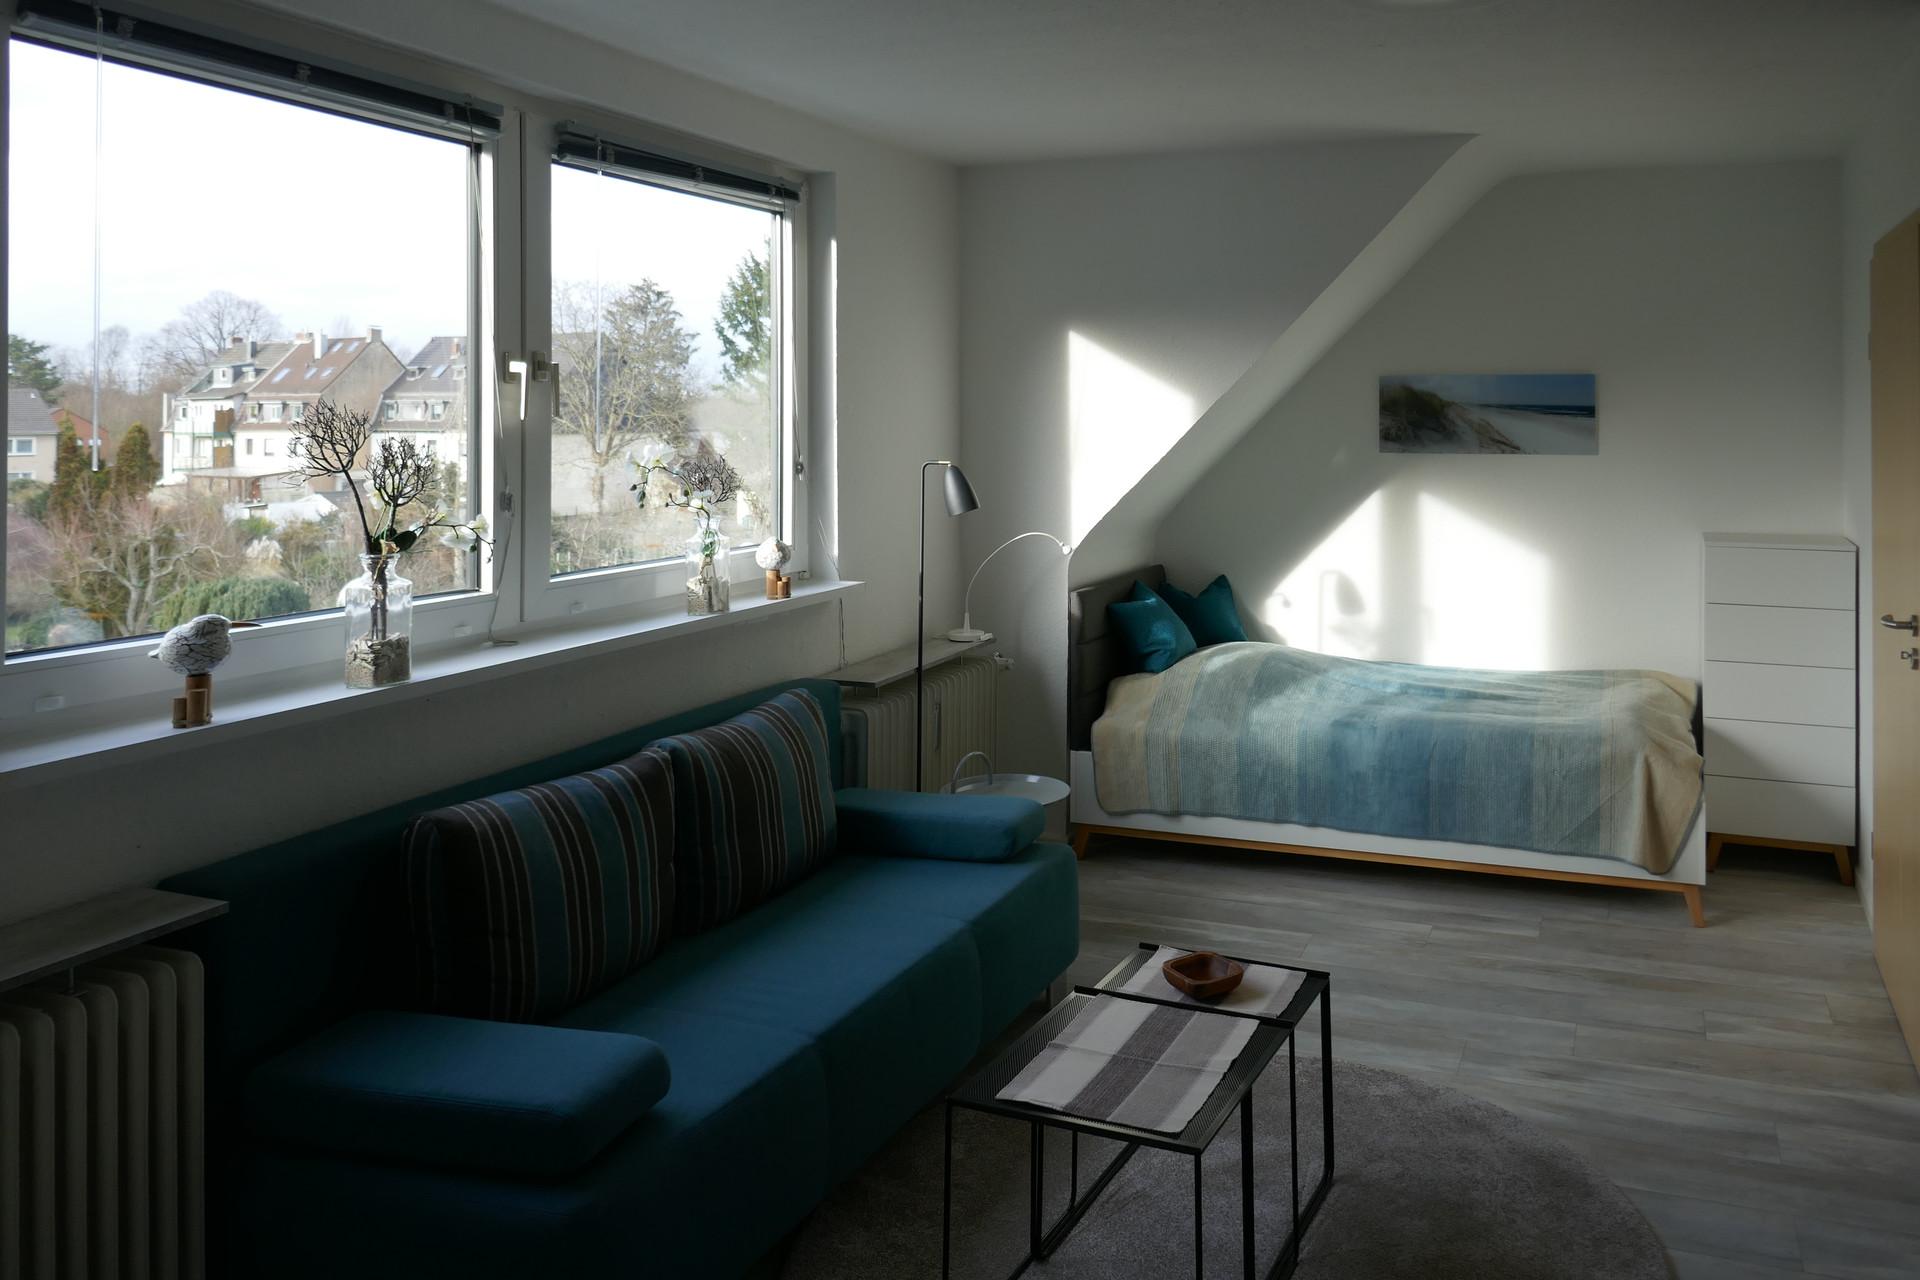 voll-ausgestattetes-2-zimmer-apartement-ccfafa8595078297624327254d8d1c02